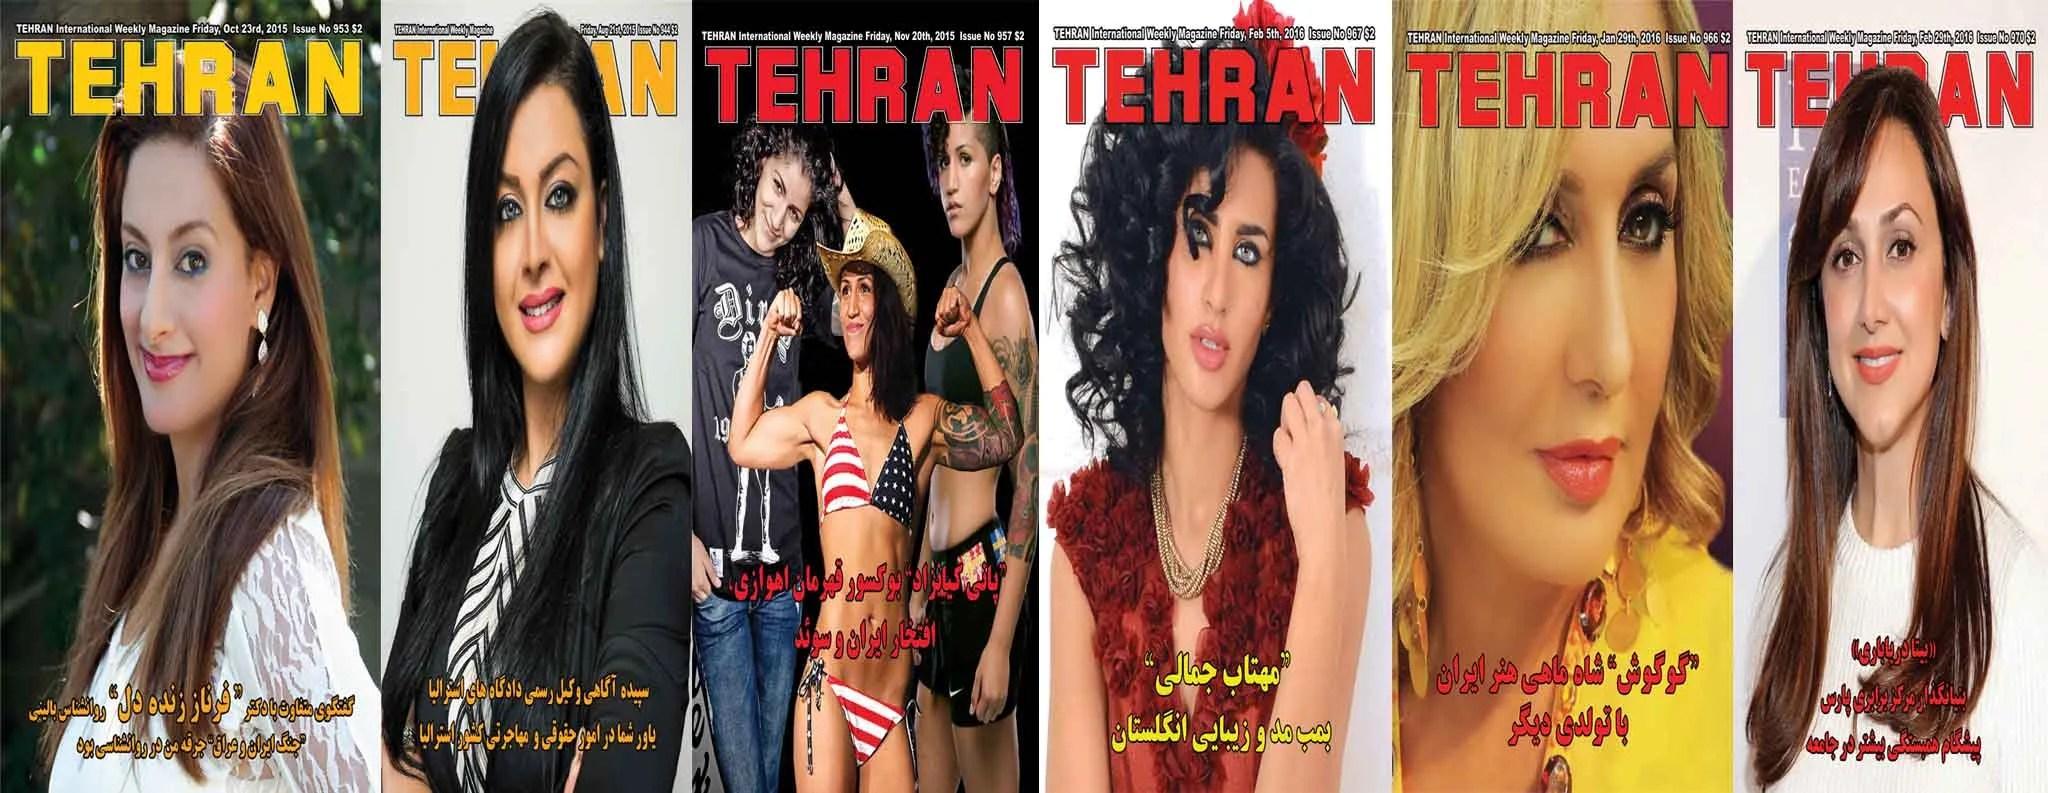 shahbod-noori-tehran-magazine-